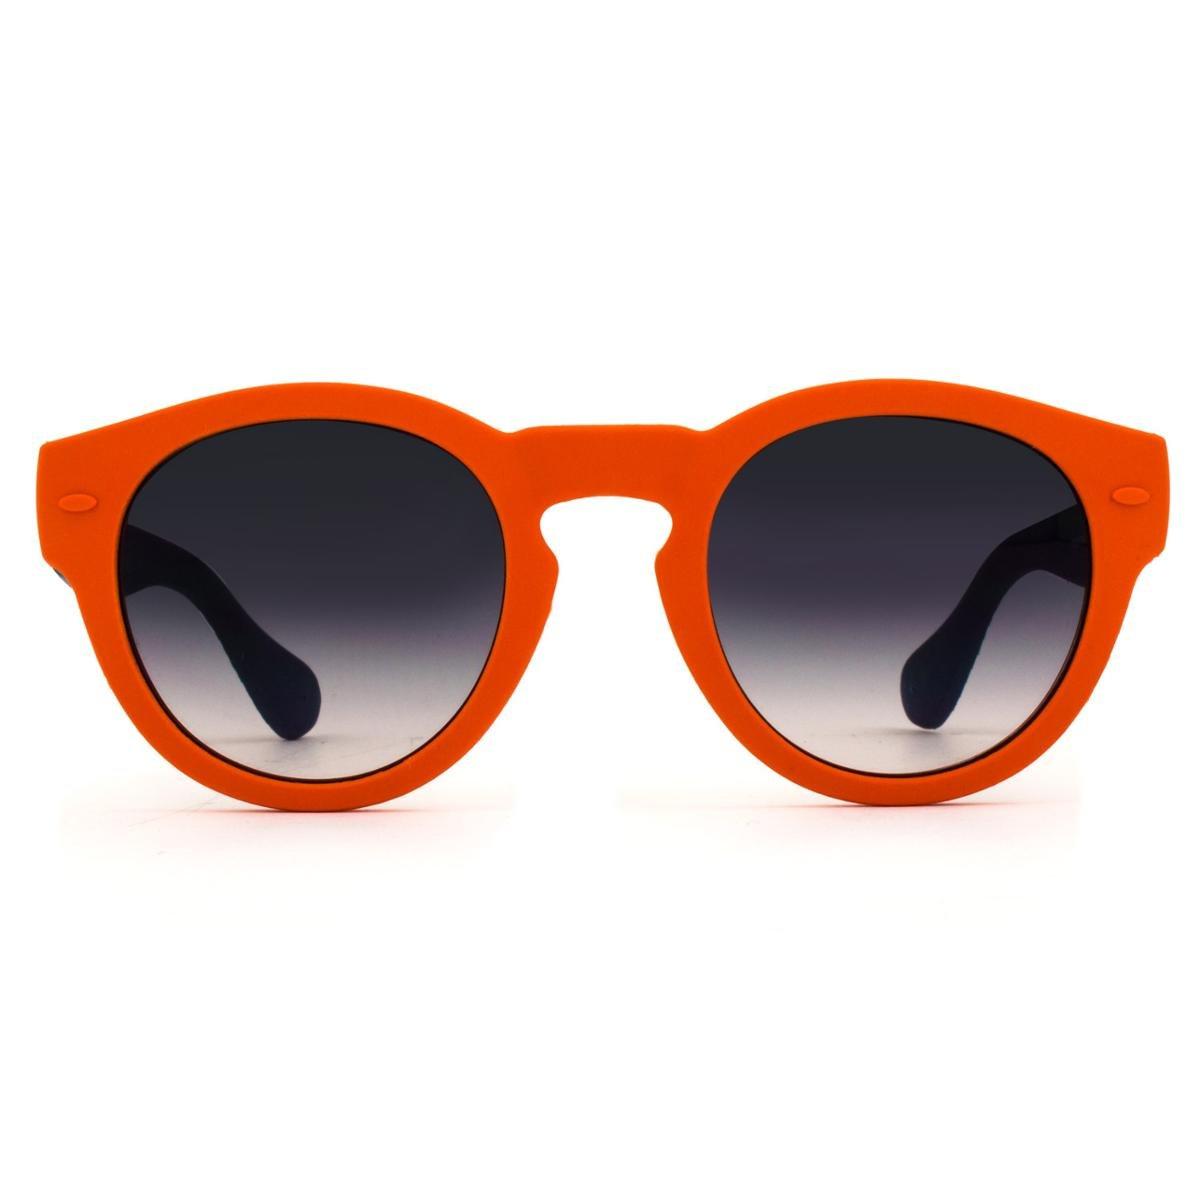 a2ace7880e1fe Óculos de Sol Havaianas Trancoso M QPS LS-49 Masculino - Compre Agora